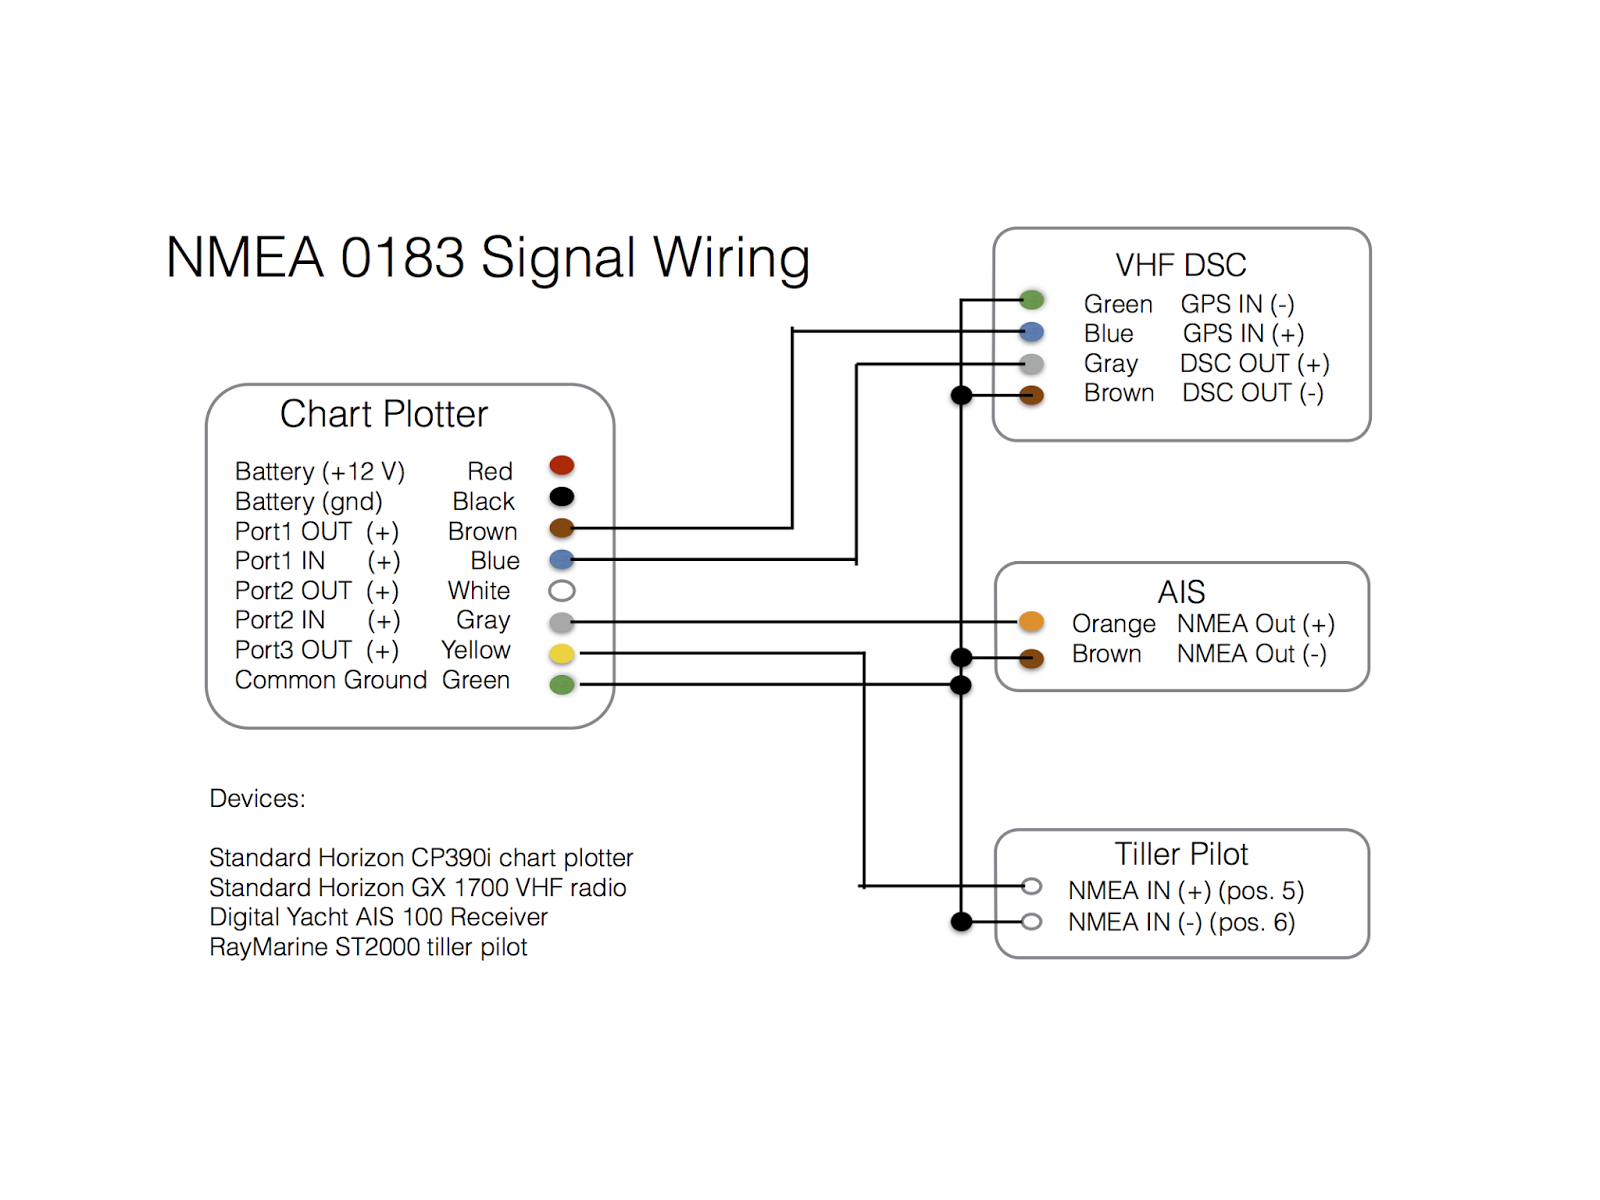 small resolution of connecting a chart plotter vhf ais receiver and tiller pilot using rh svripple blogspot com garmin nmea 0183 wiring diagram garmin nmea 0183 wiring diagram